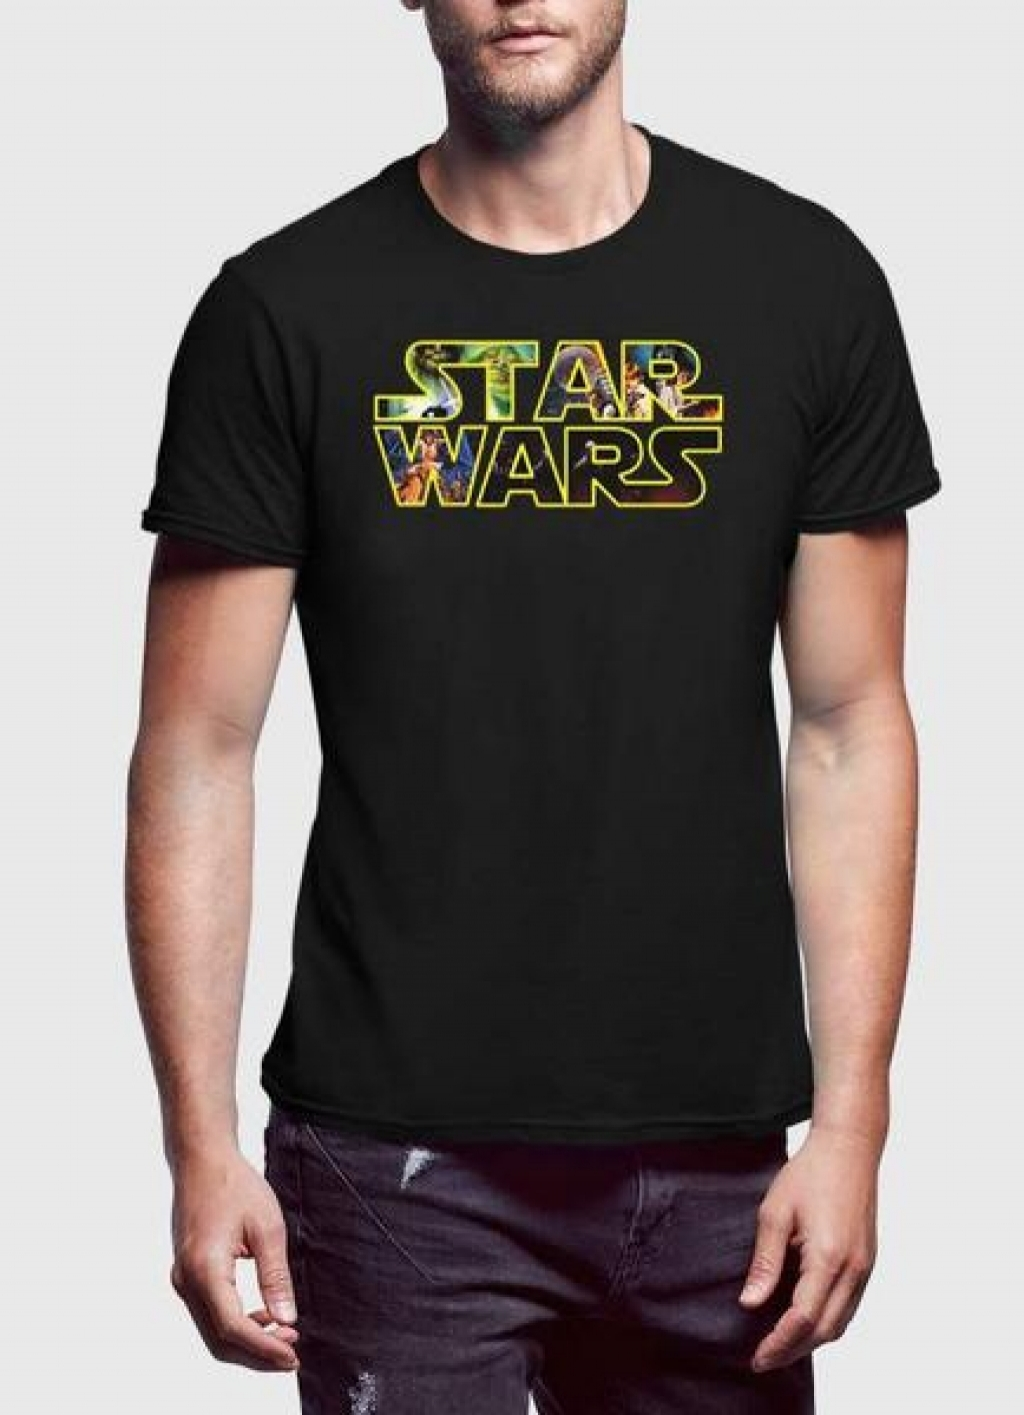 14992679690_Affordable_STAR_WARS-t-shirt.jpg